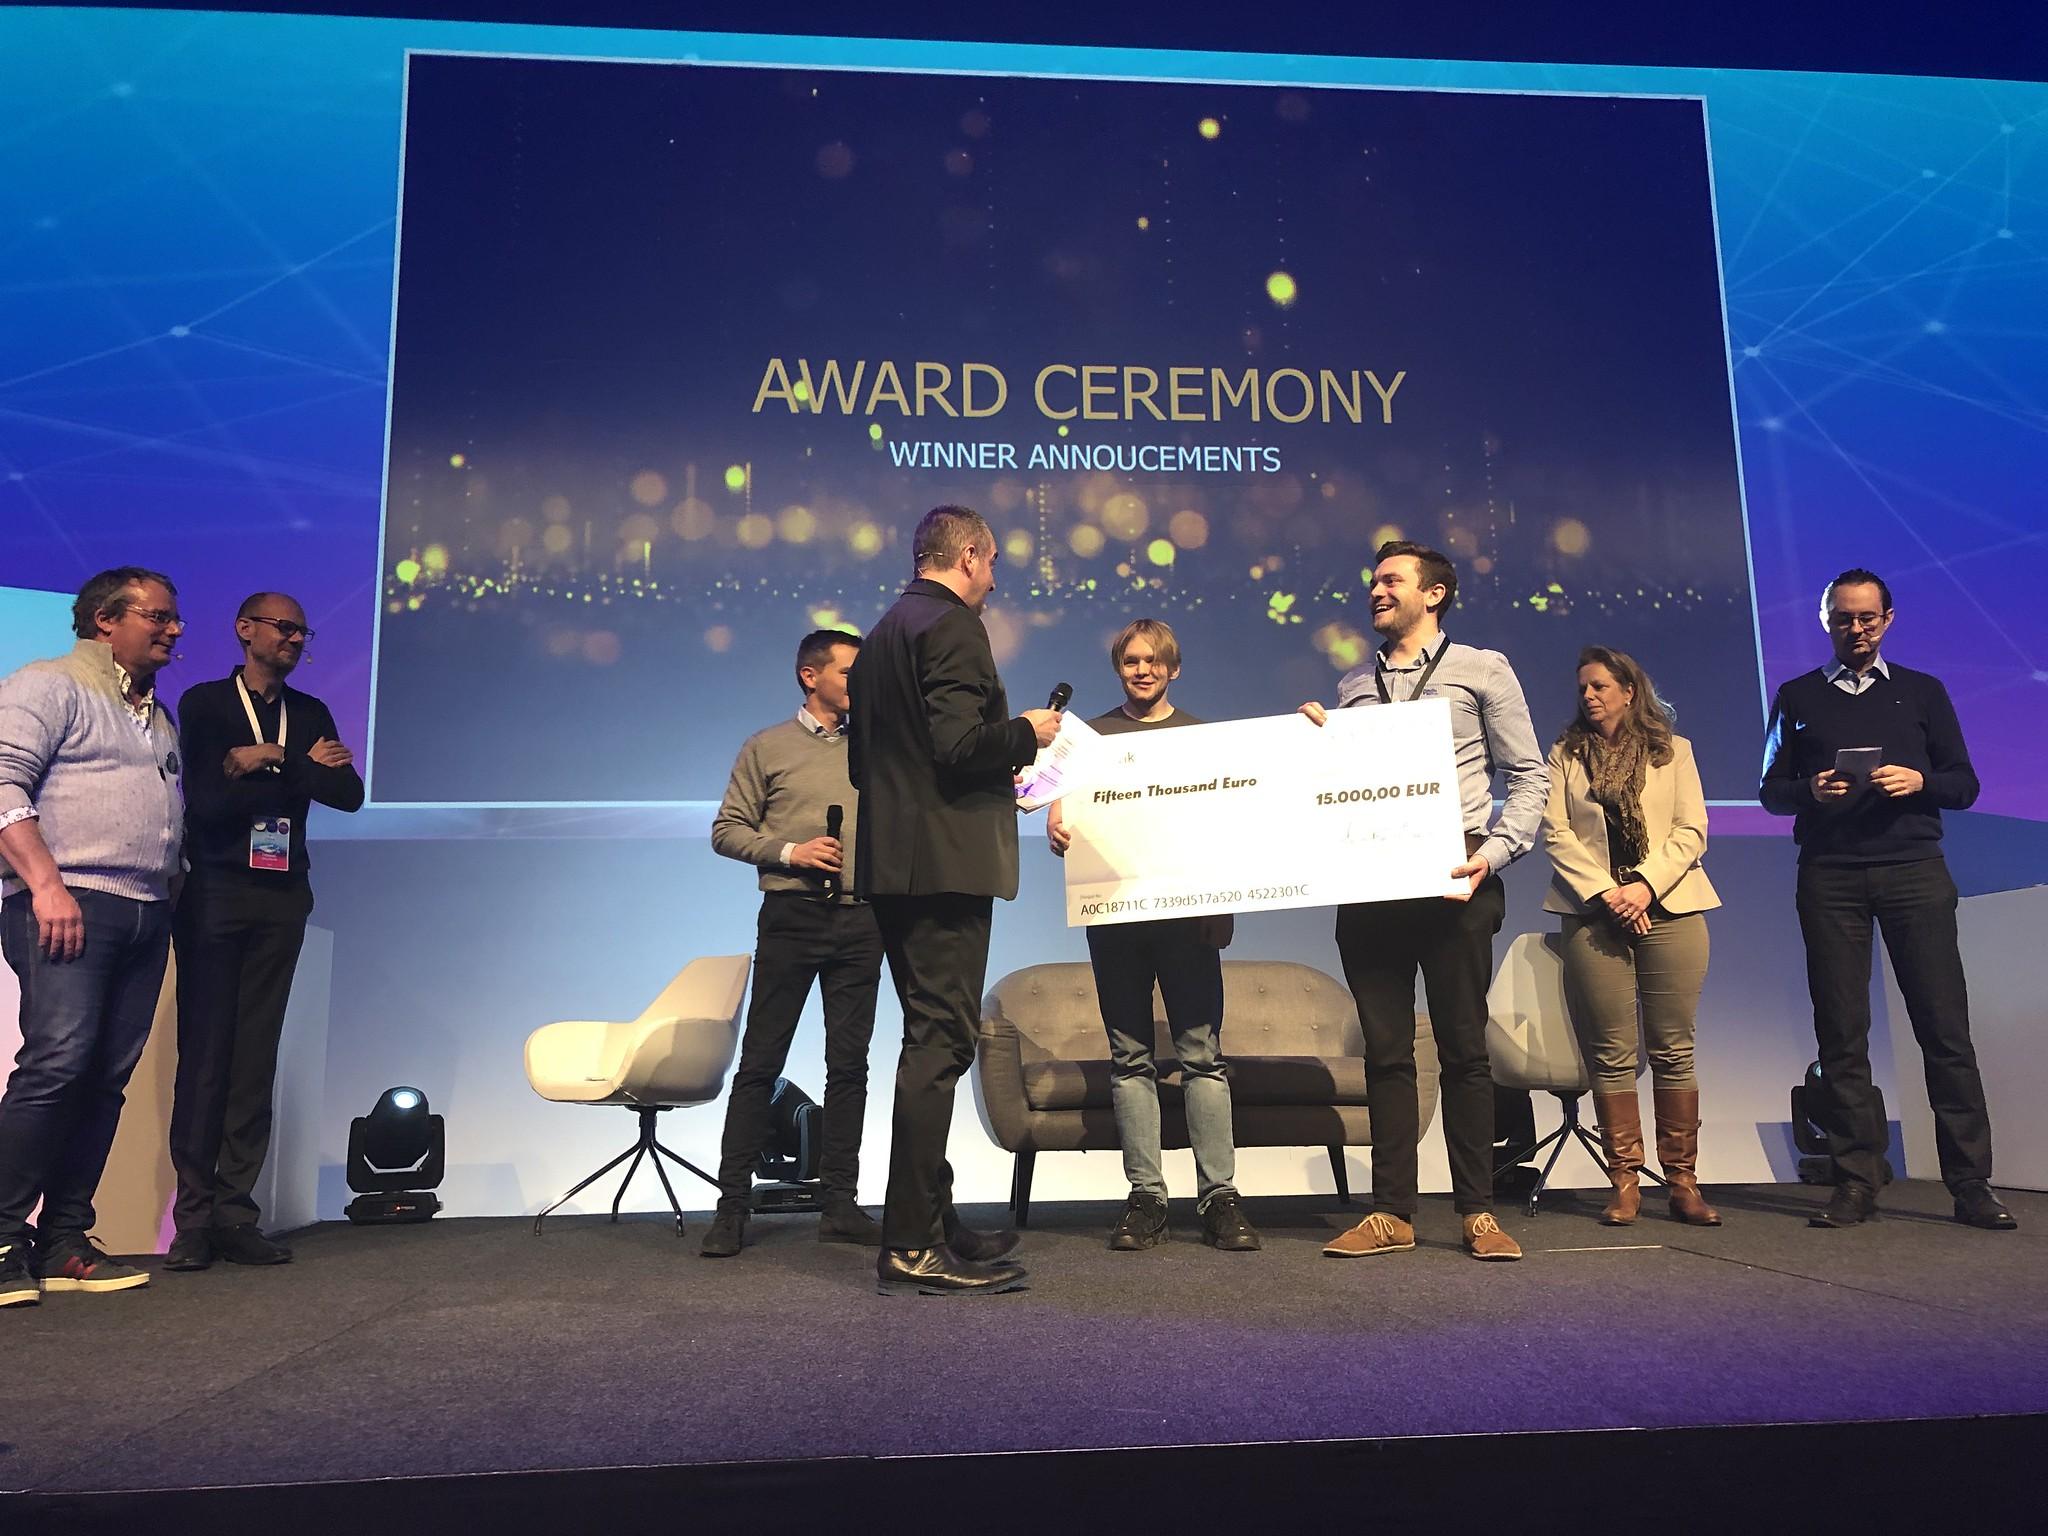 Hackathon Awards Ceremony at HackDays 2019